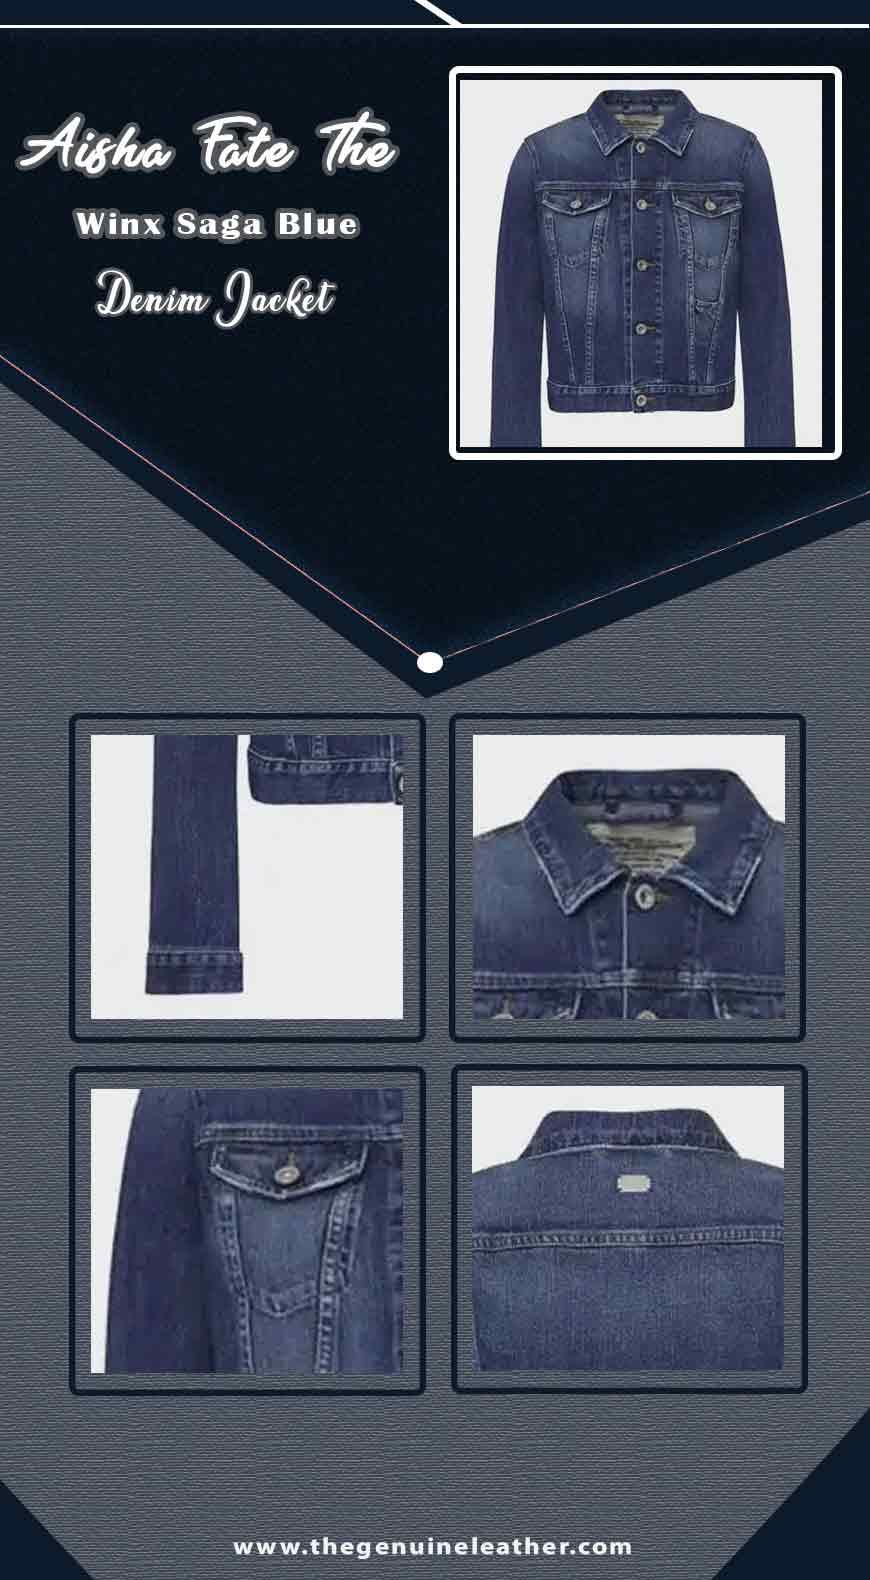 Aisha Fate The Winx Saga Blue Denim Jacket info